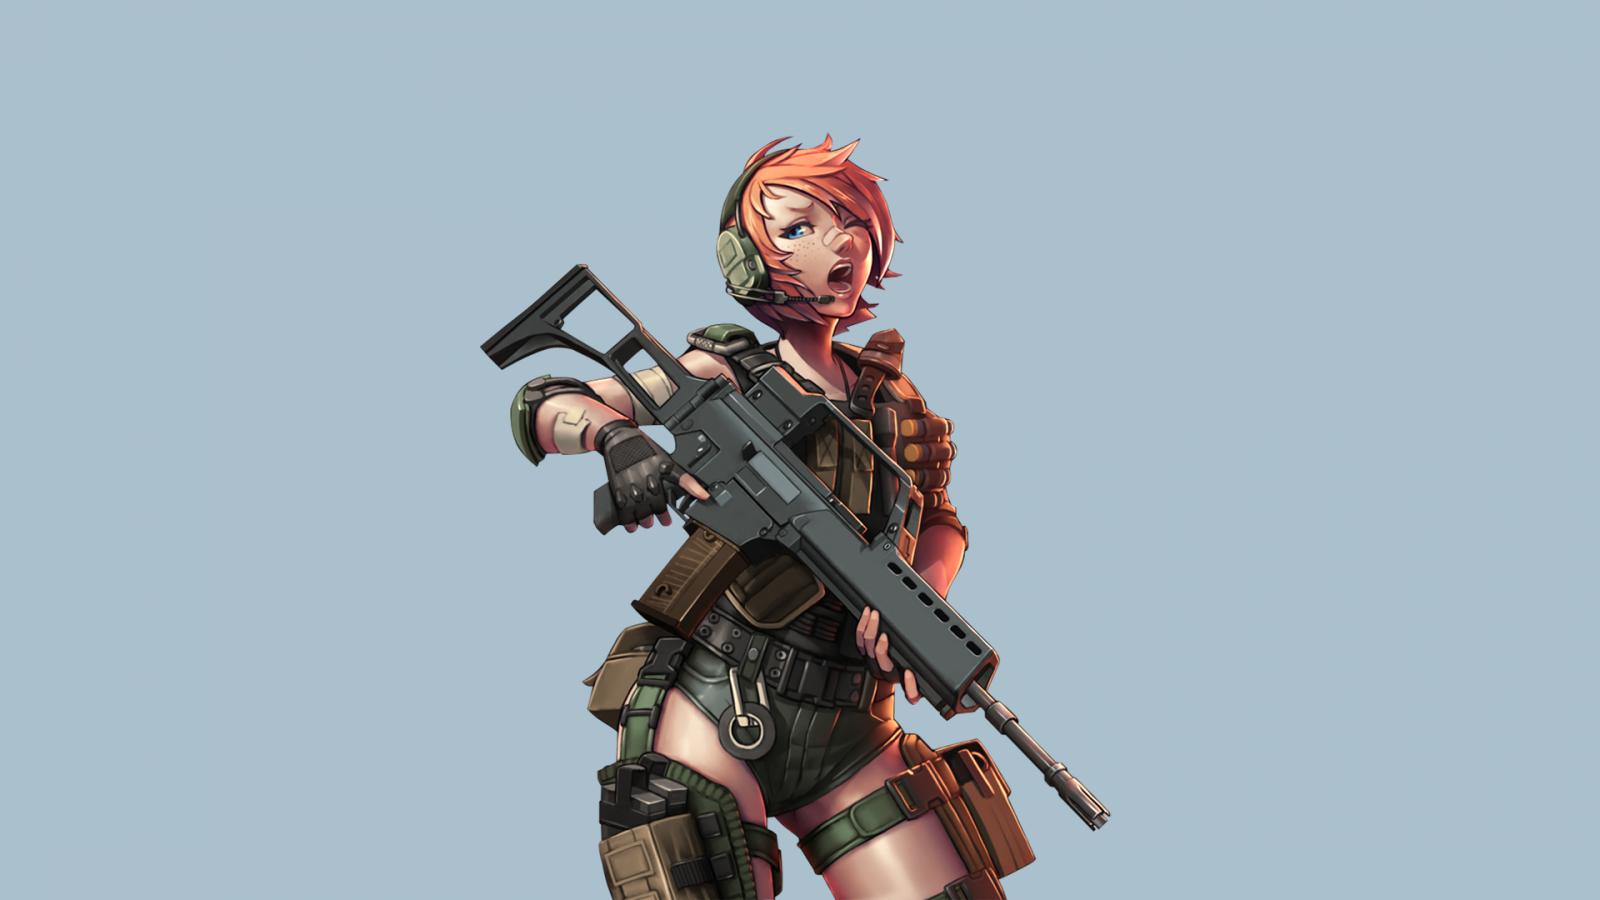 Wallpaper anime girls redhead gun weapon short hair - Anime girl with weapon ...